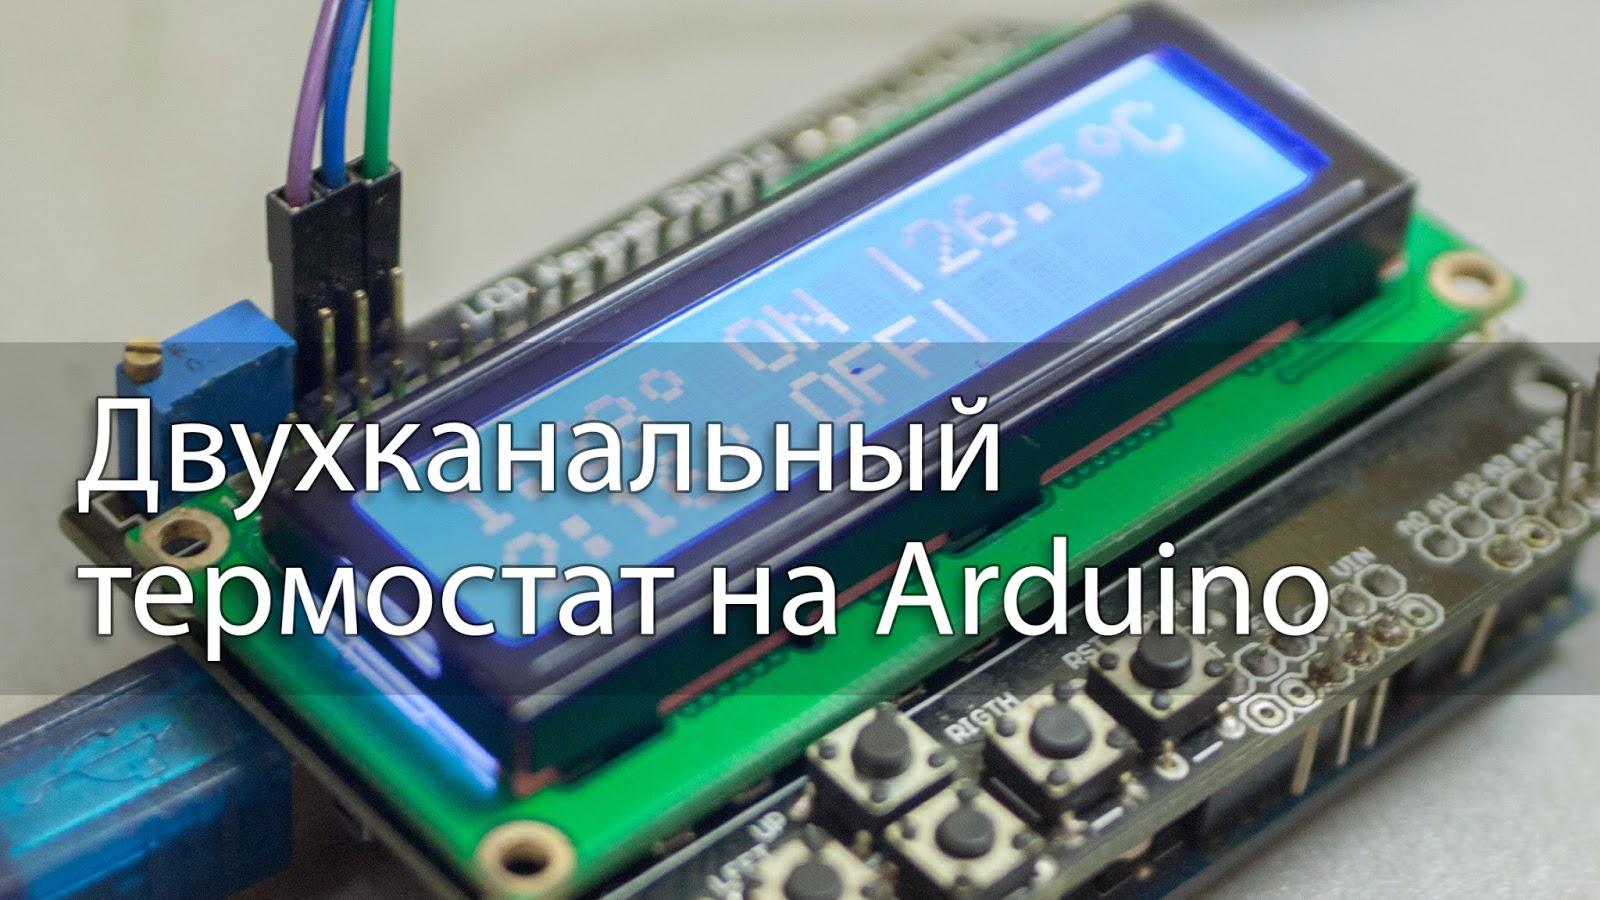 http://arrduinolab.blogspot.com/2014/09/arduino.html